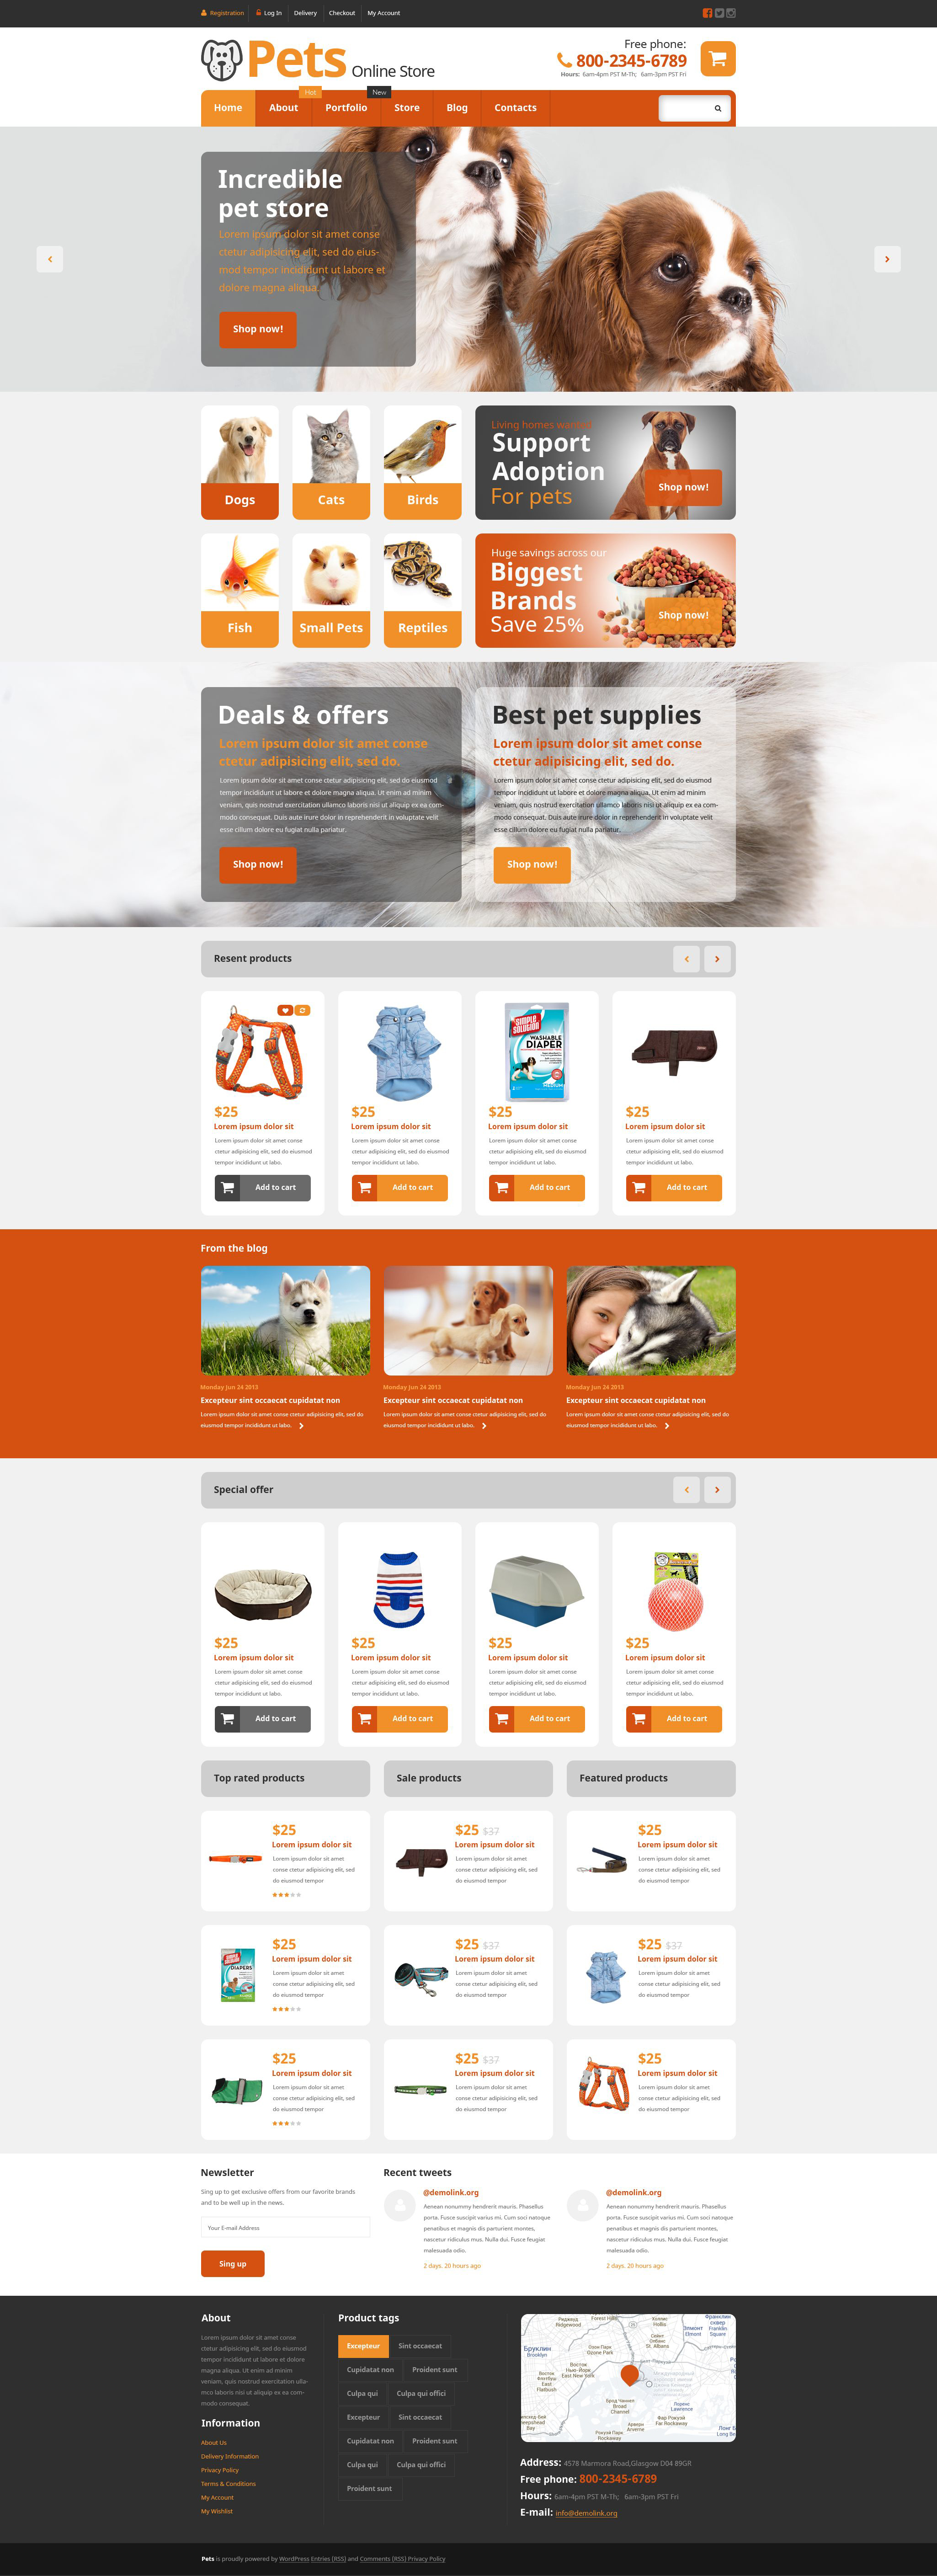 Pets Online Store №54868 - скриншот